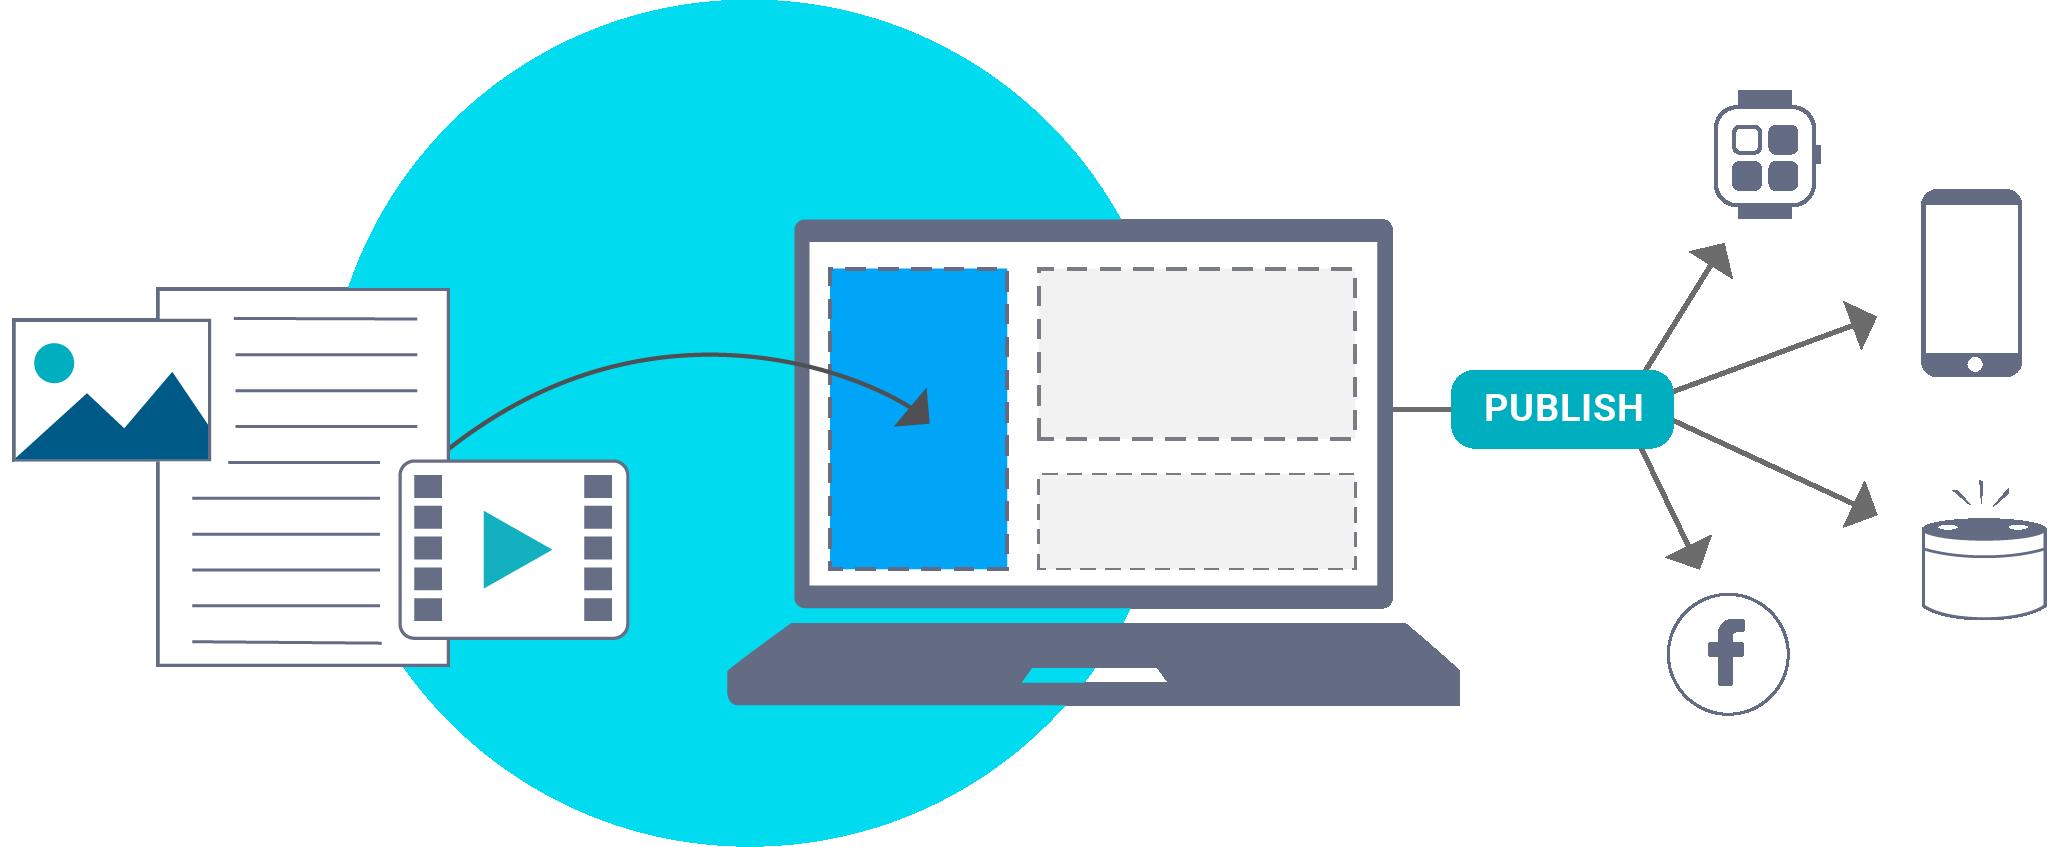 .NET Content Management Strategy & Implementation